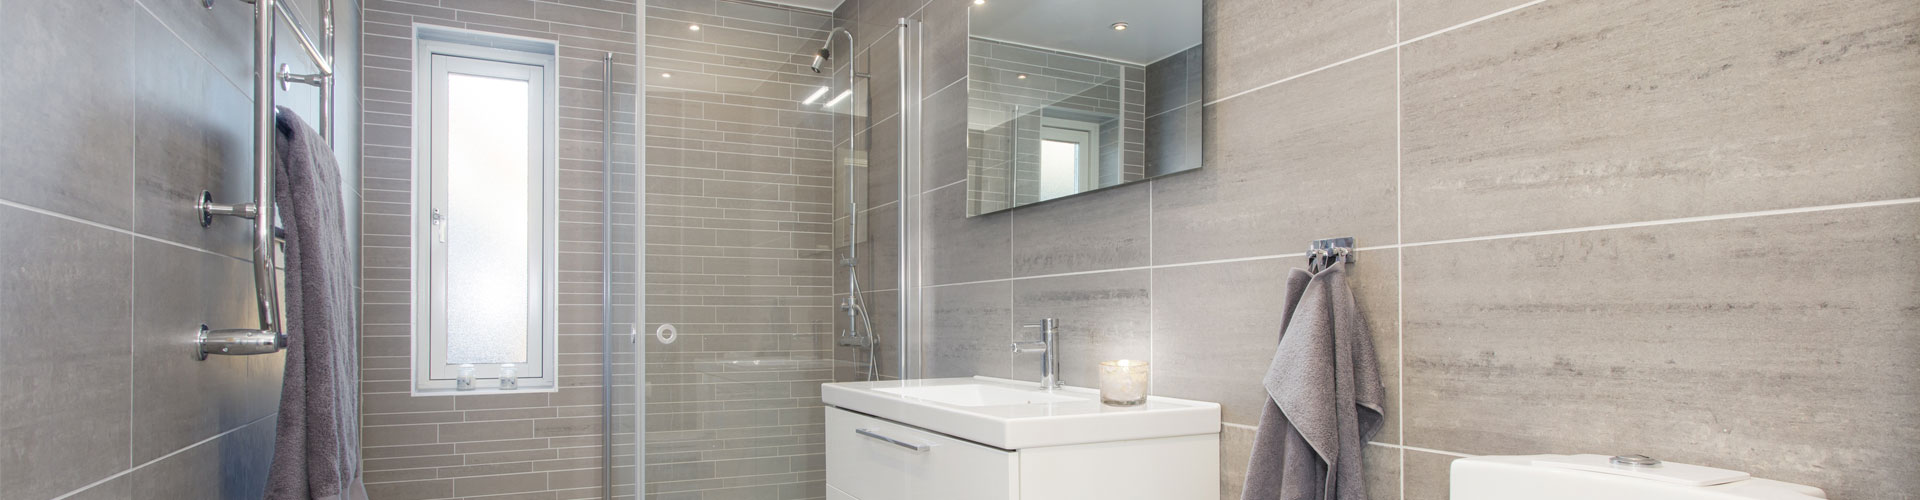 Leaking Showers Ams Property Renovations Bathroom Renovations